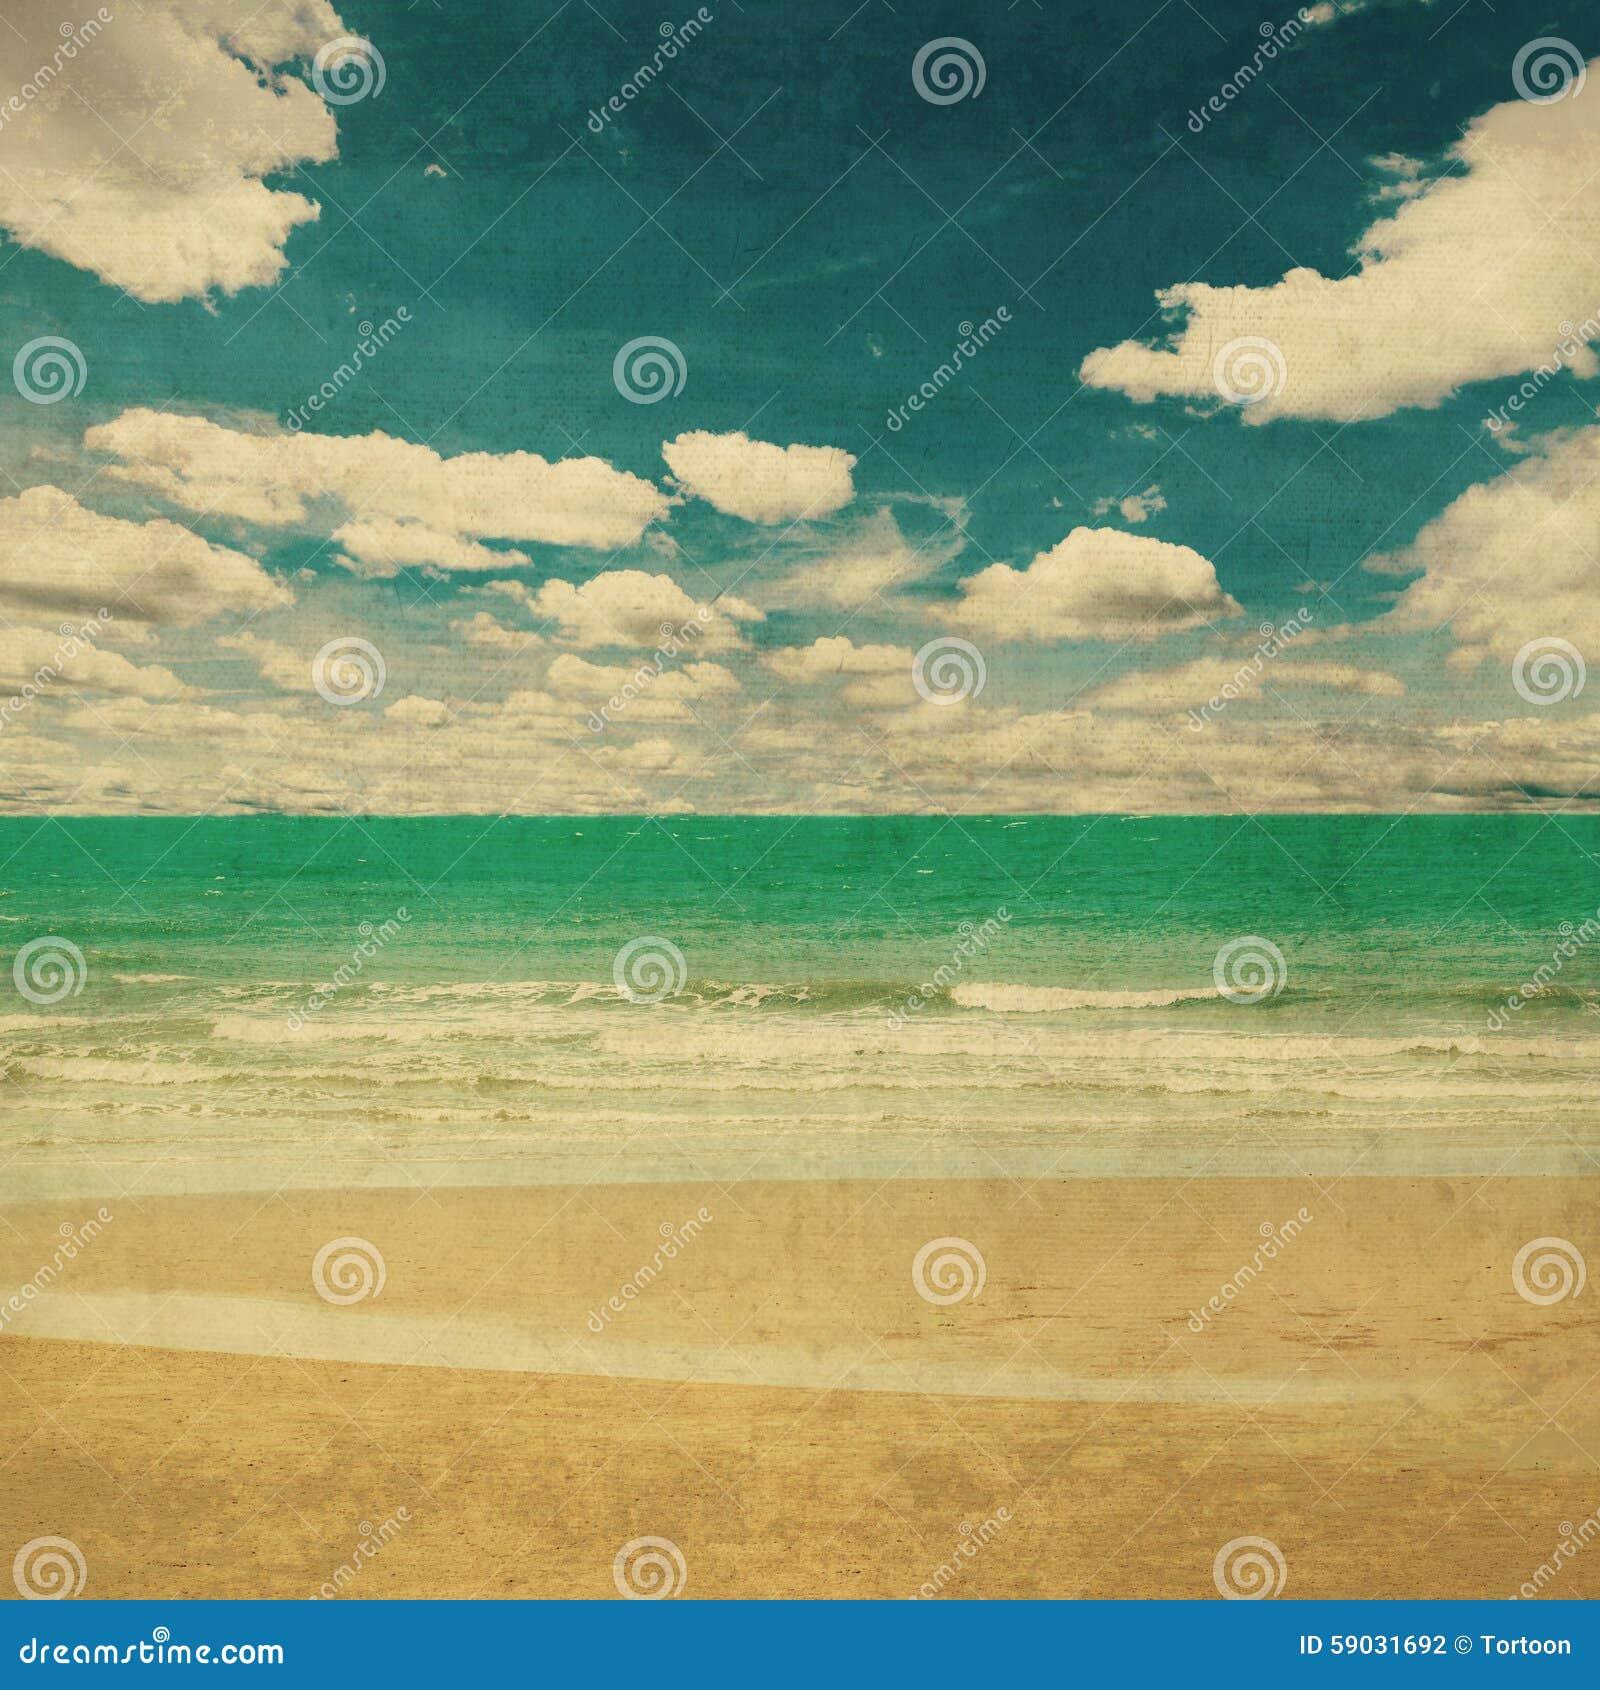 Vintage Beach Background Stock Photo 112981333: Beach Sea And Grunge Canvas Texture Vintage Stock Photo